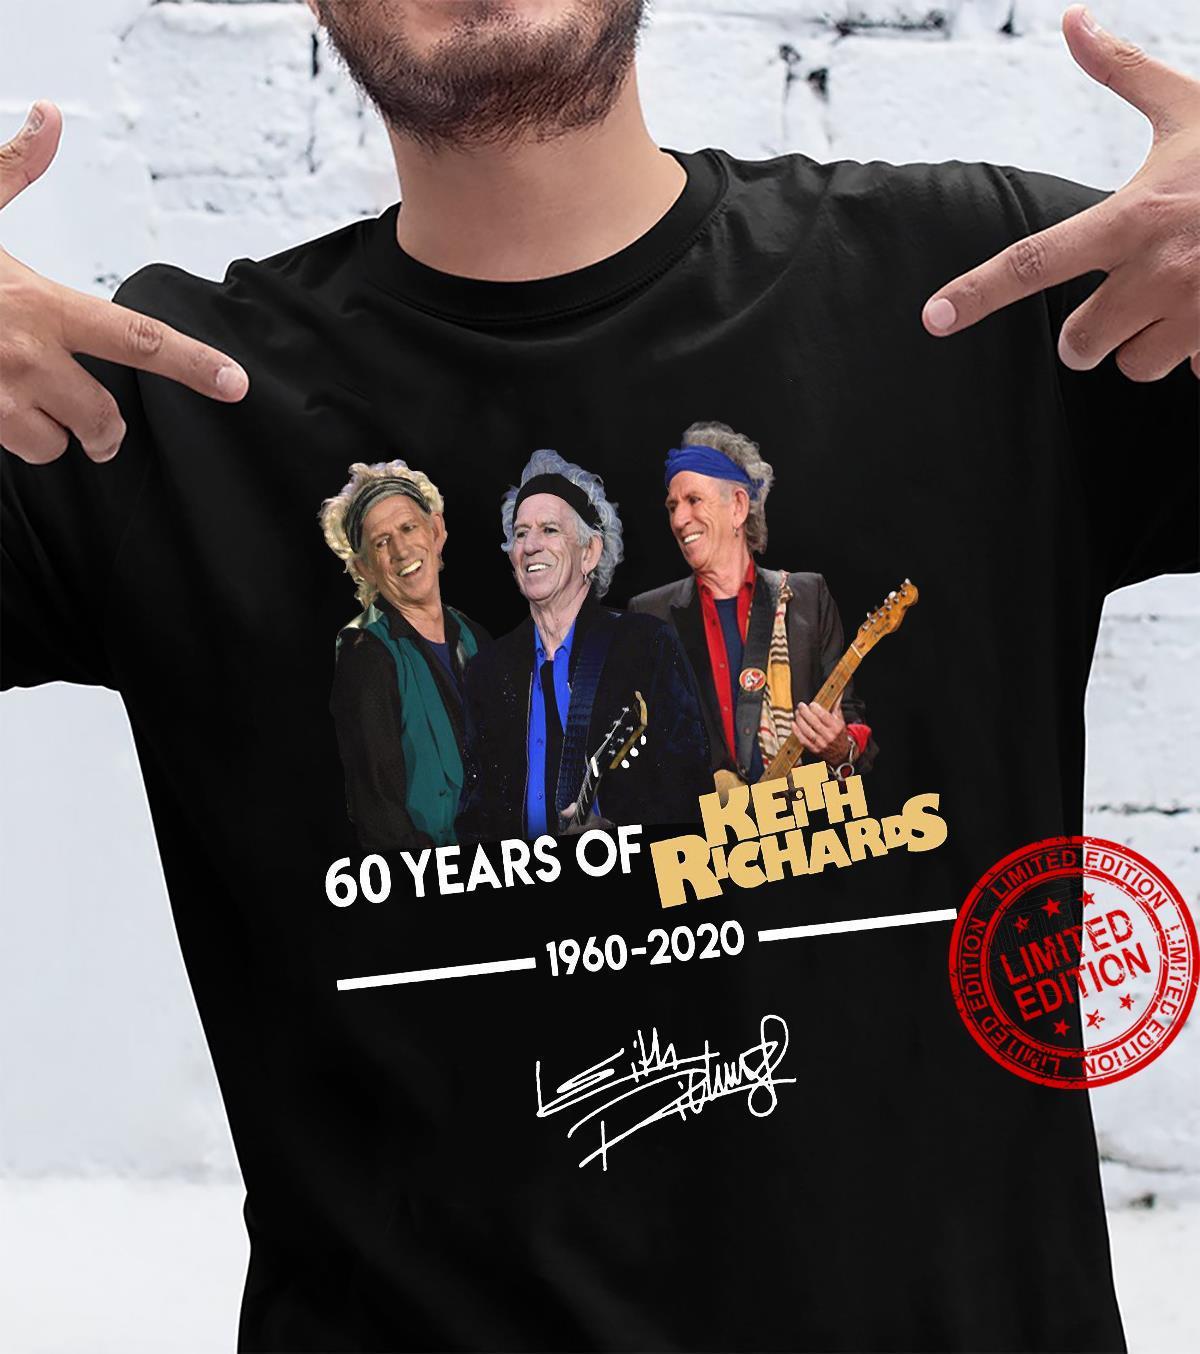 60 Years Of Keith Richards 1960-2020 Shirt